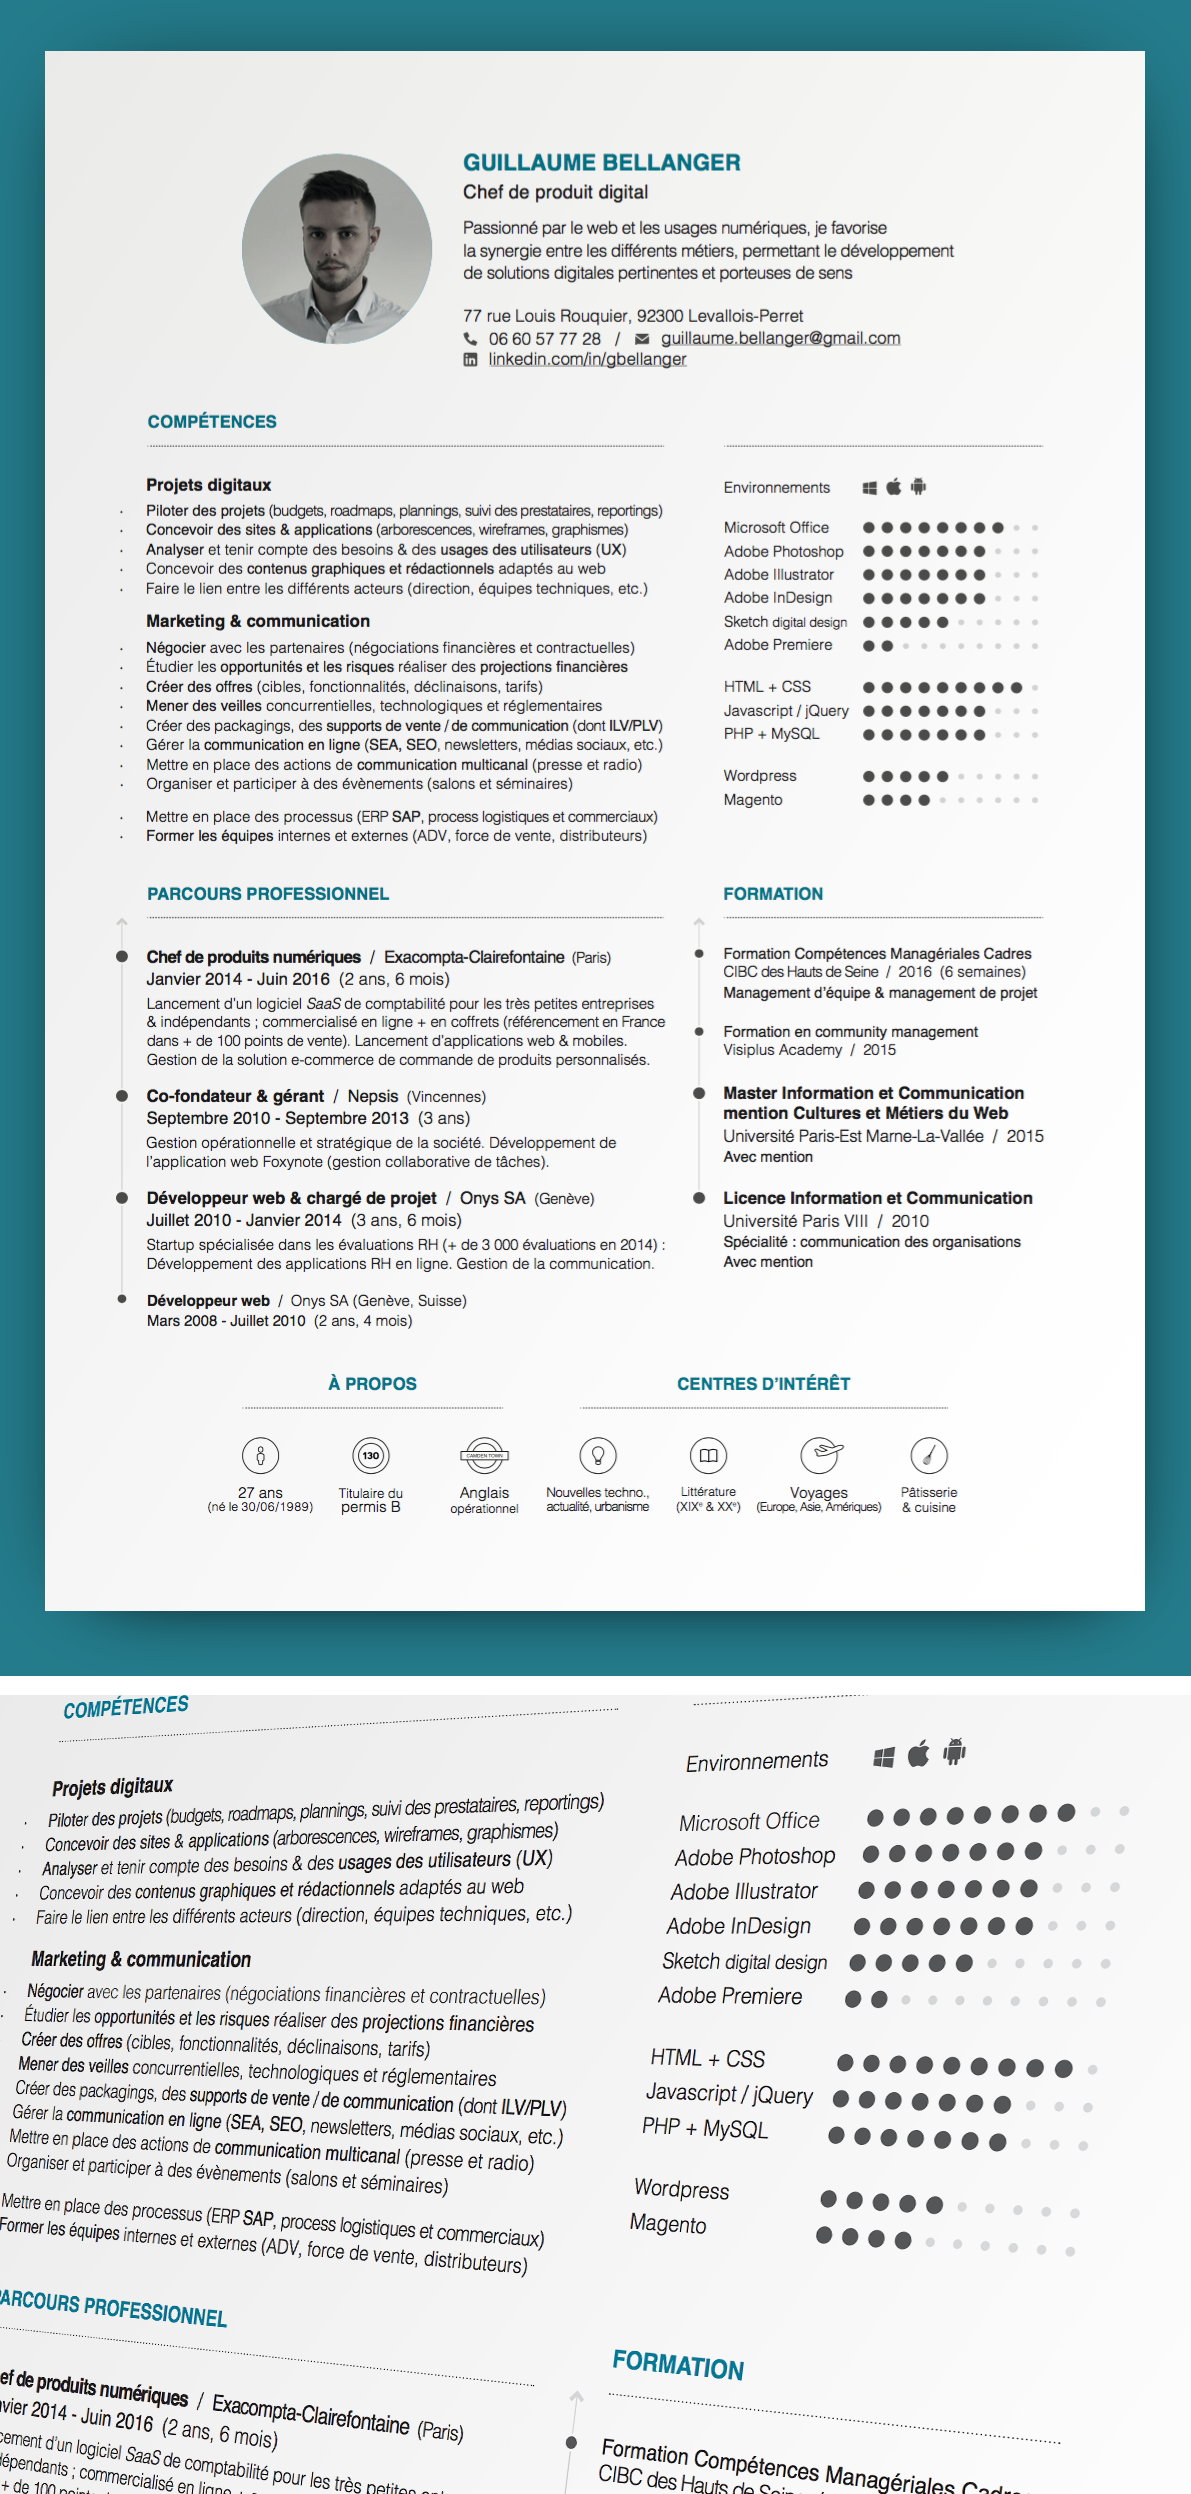 Curriculum Vitae Cv Resume Guillaume Bellanger Chef De Produit Digital Digital Product Manager Curriculum Vitae Cv Consultant Curriculum